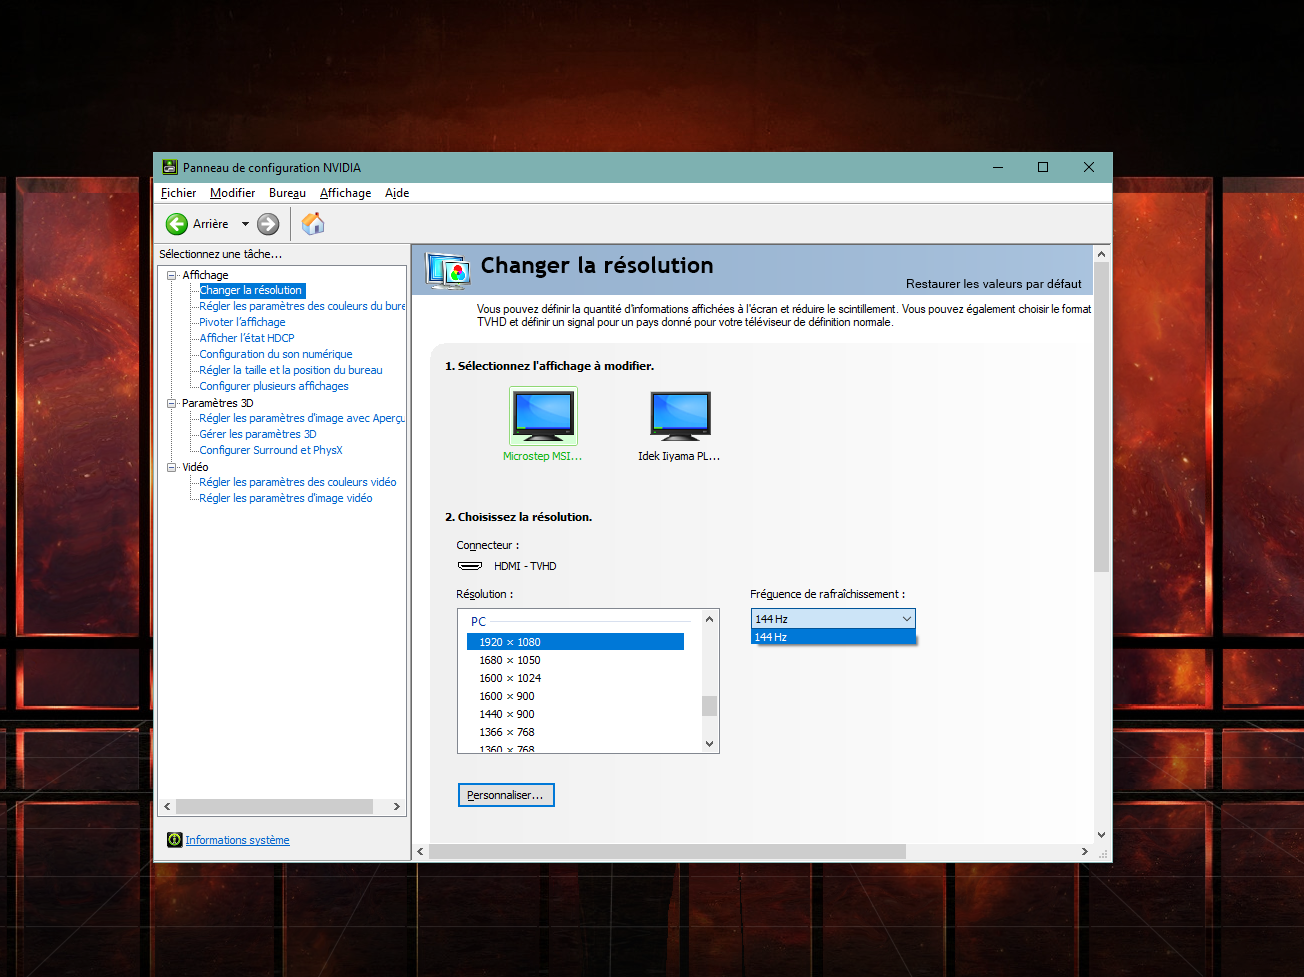 DesktopScreenshot2021.02.19-00.36.13.772.png